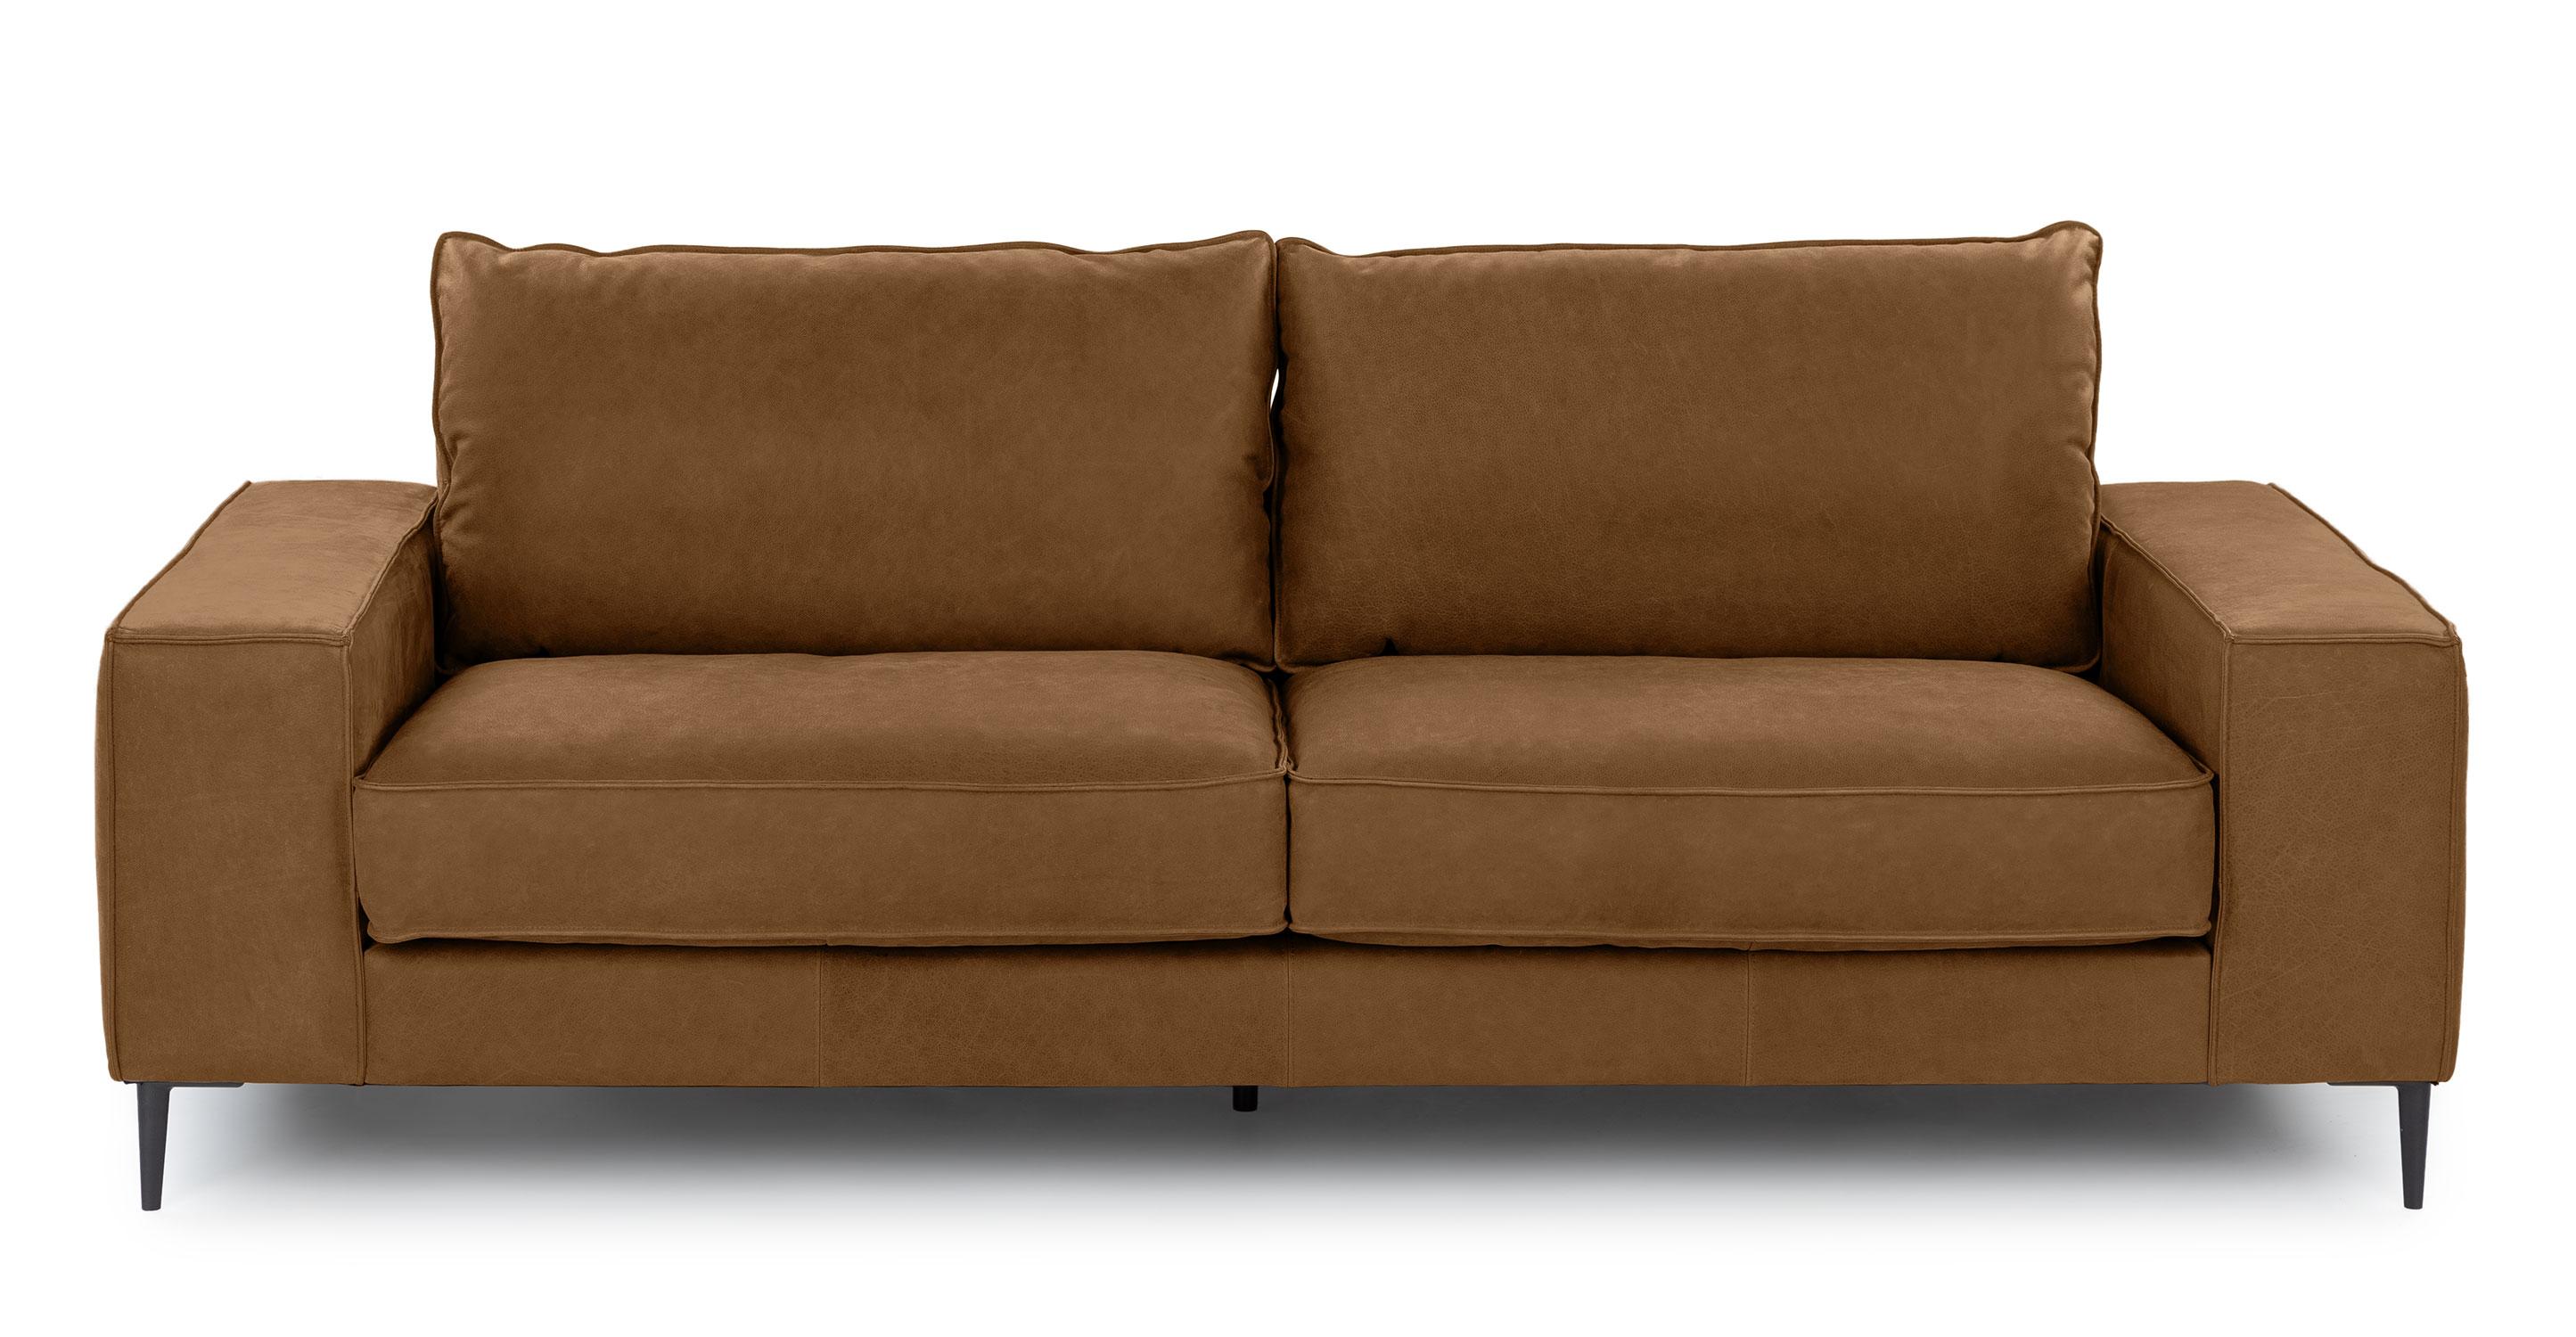 Tobacco Tan Tora Leather 2 Seater Sofa Article